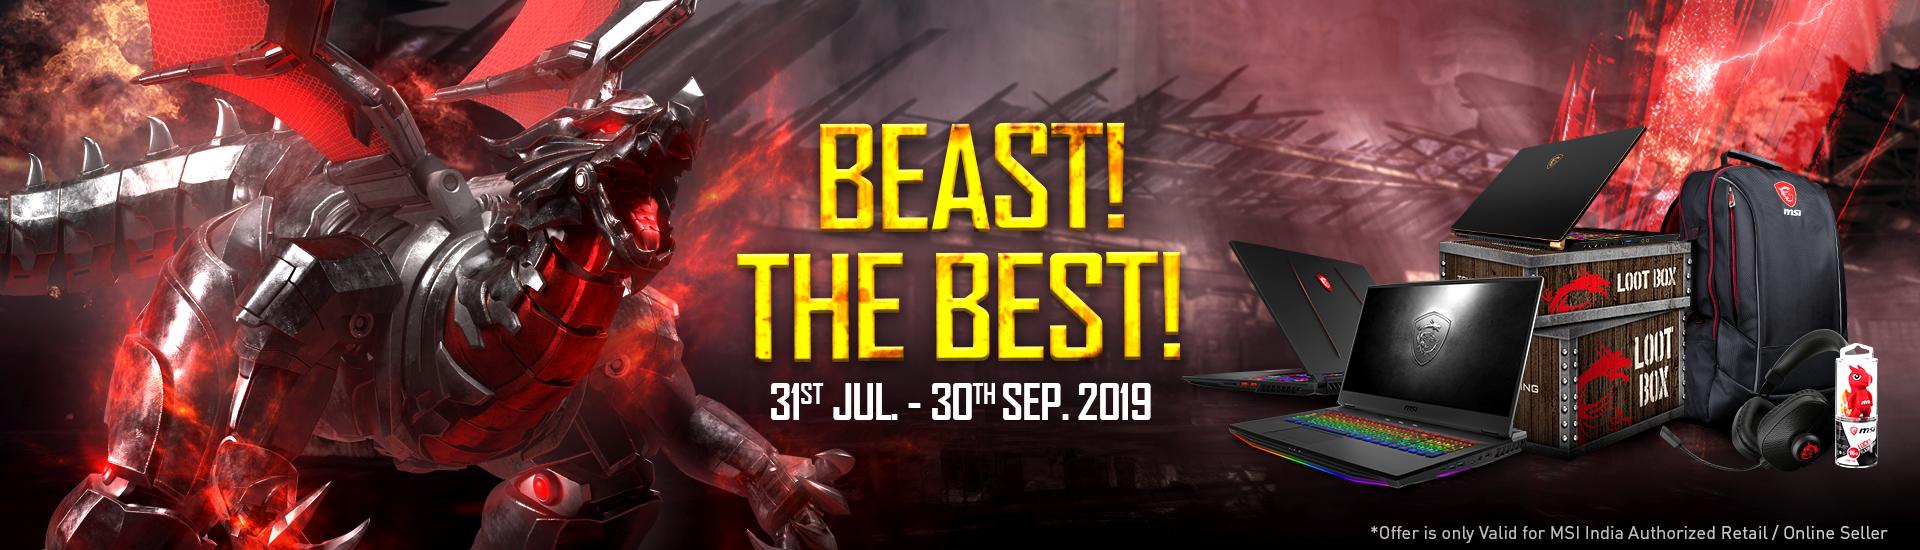 Beast! The Best!